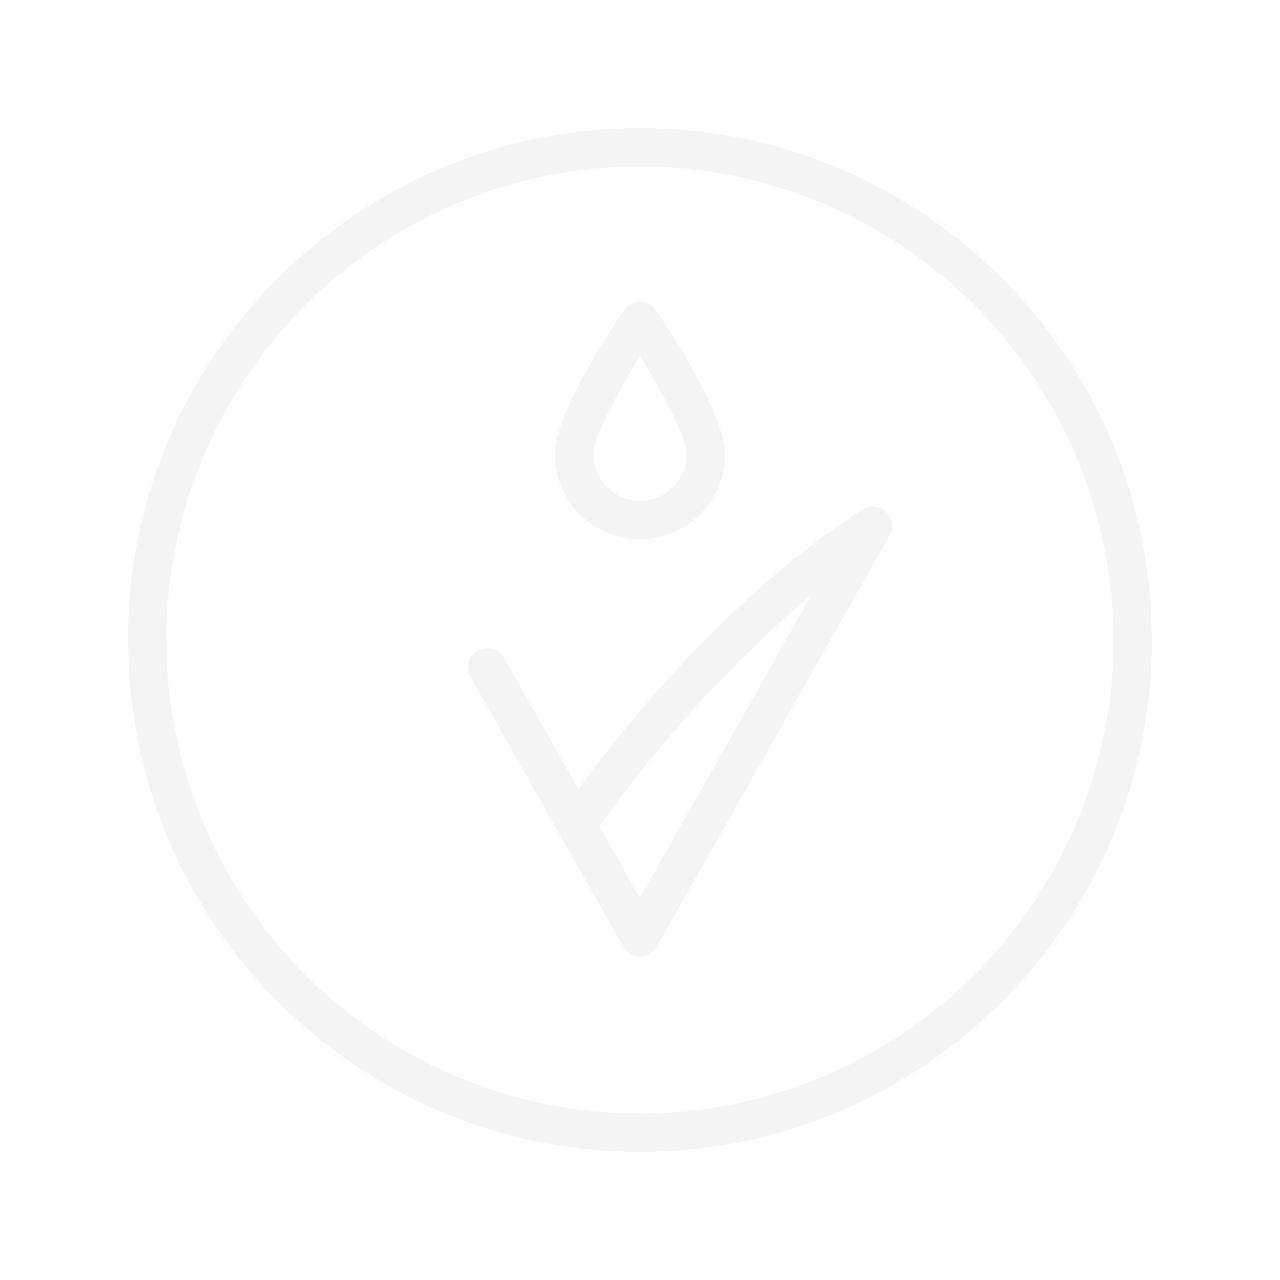 Dior Diorskin Rosy Glow Blush No.001 Petal 7.5g